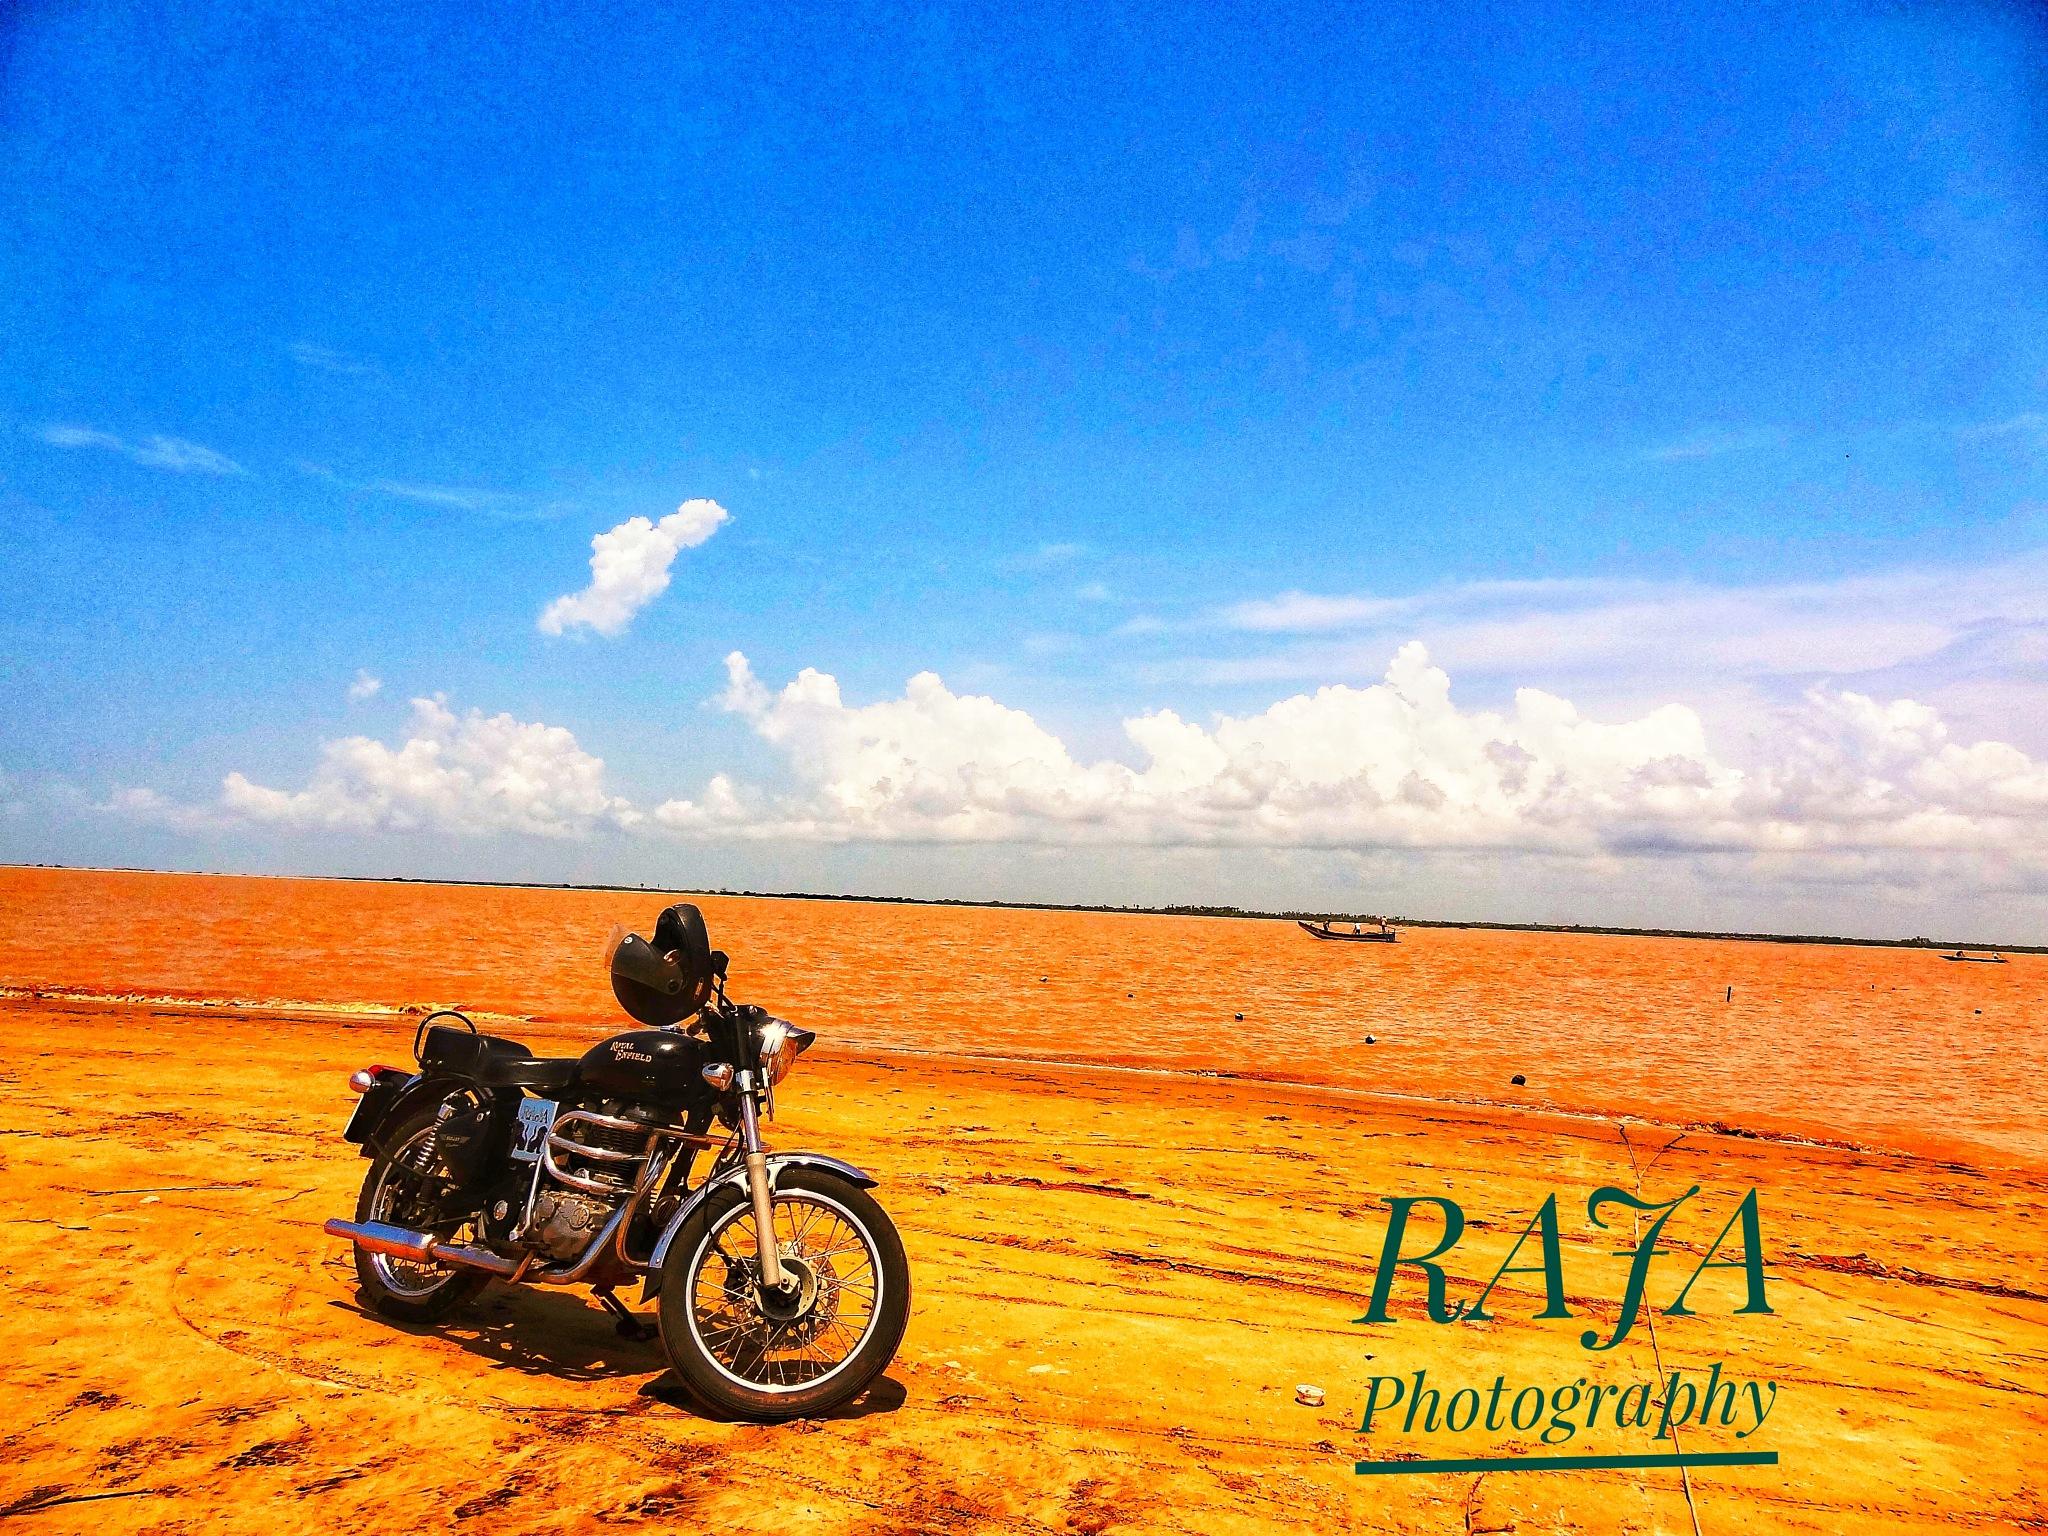 Royal enfield by V S Rajesh Kusu 【RAJA】